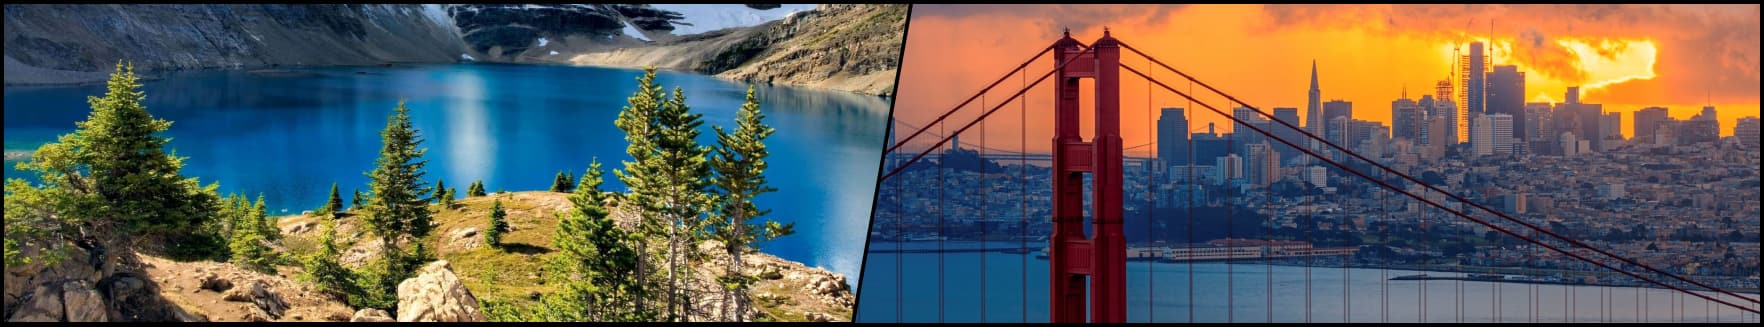 Yosemite - San Francisco